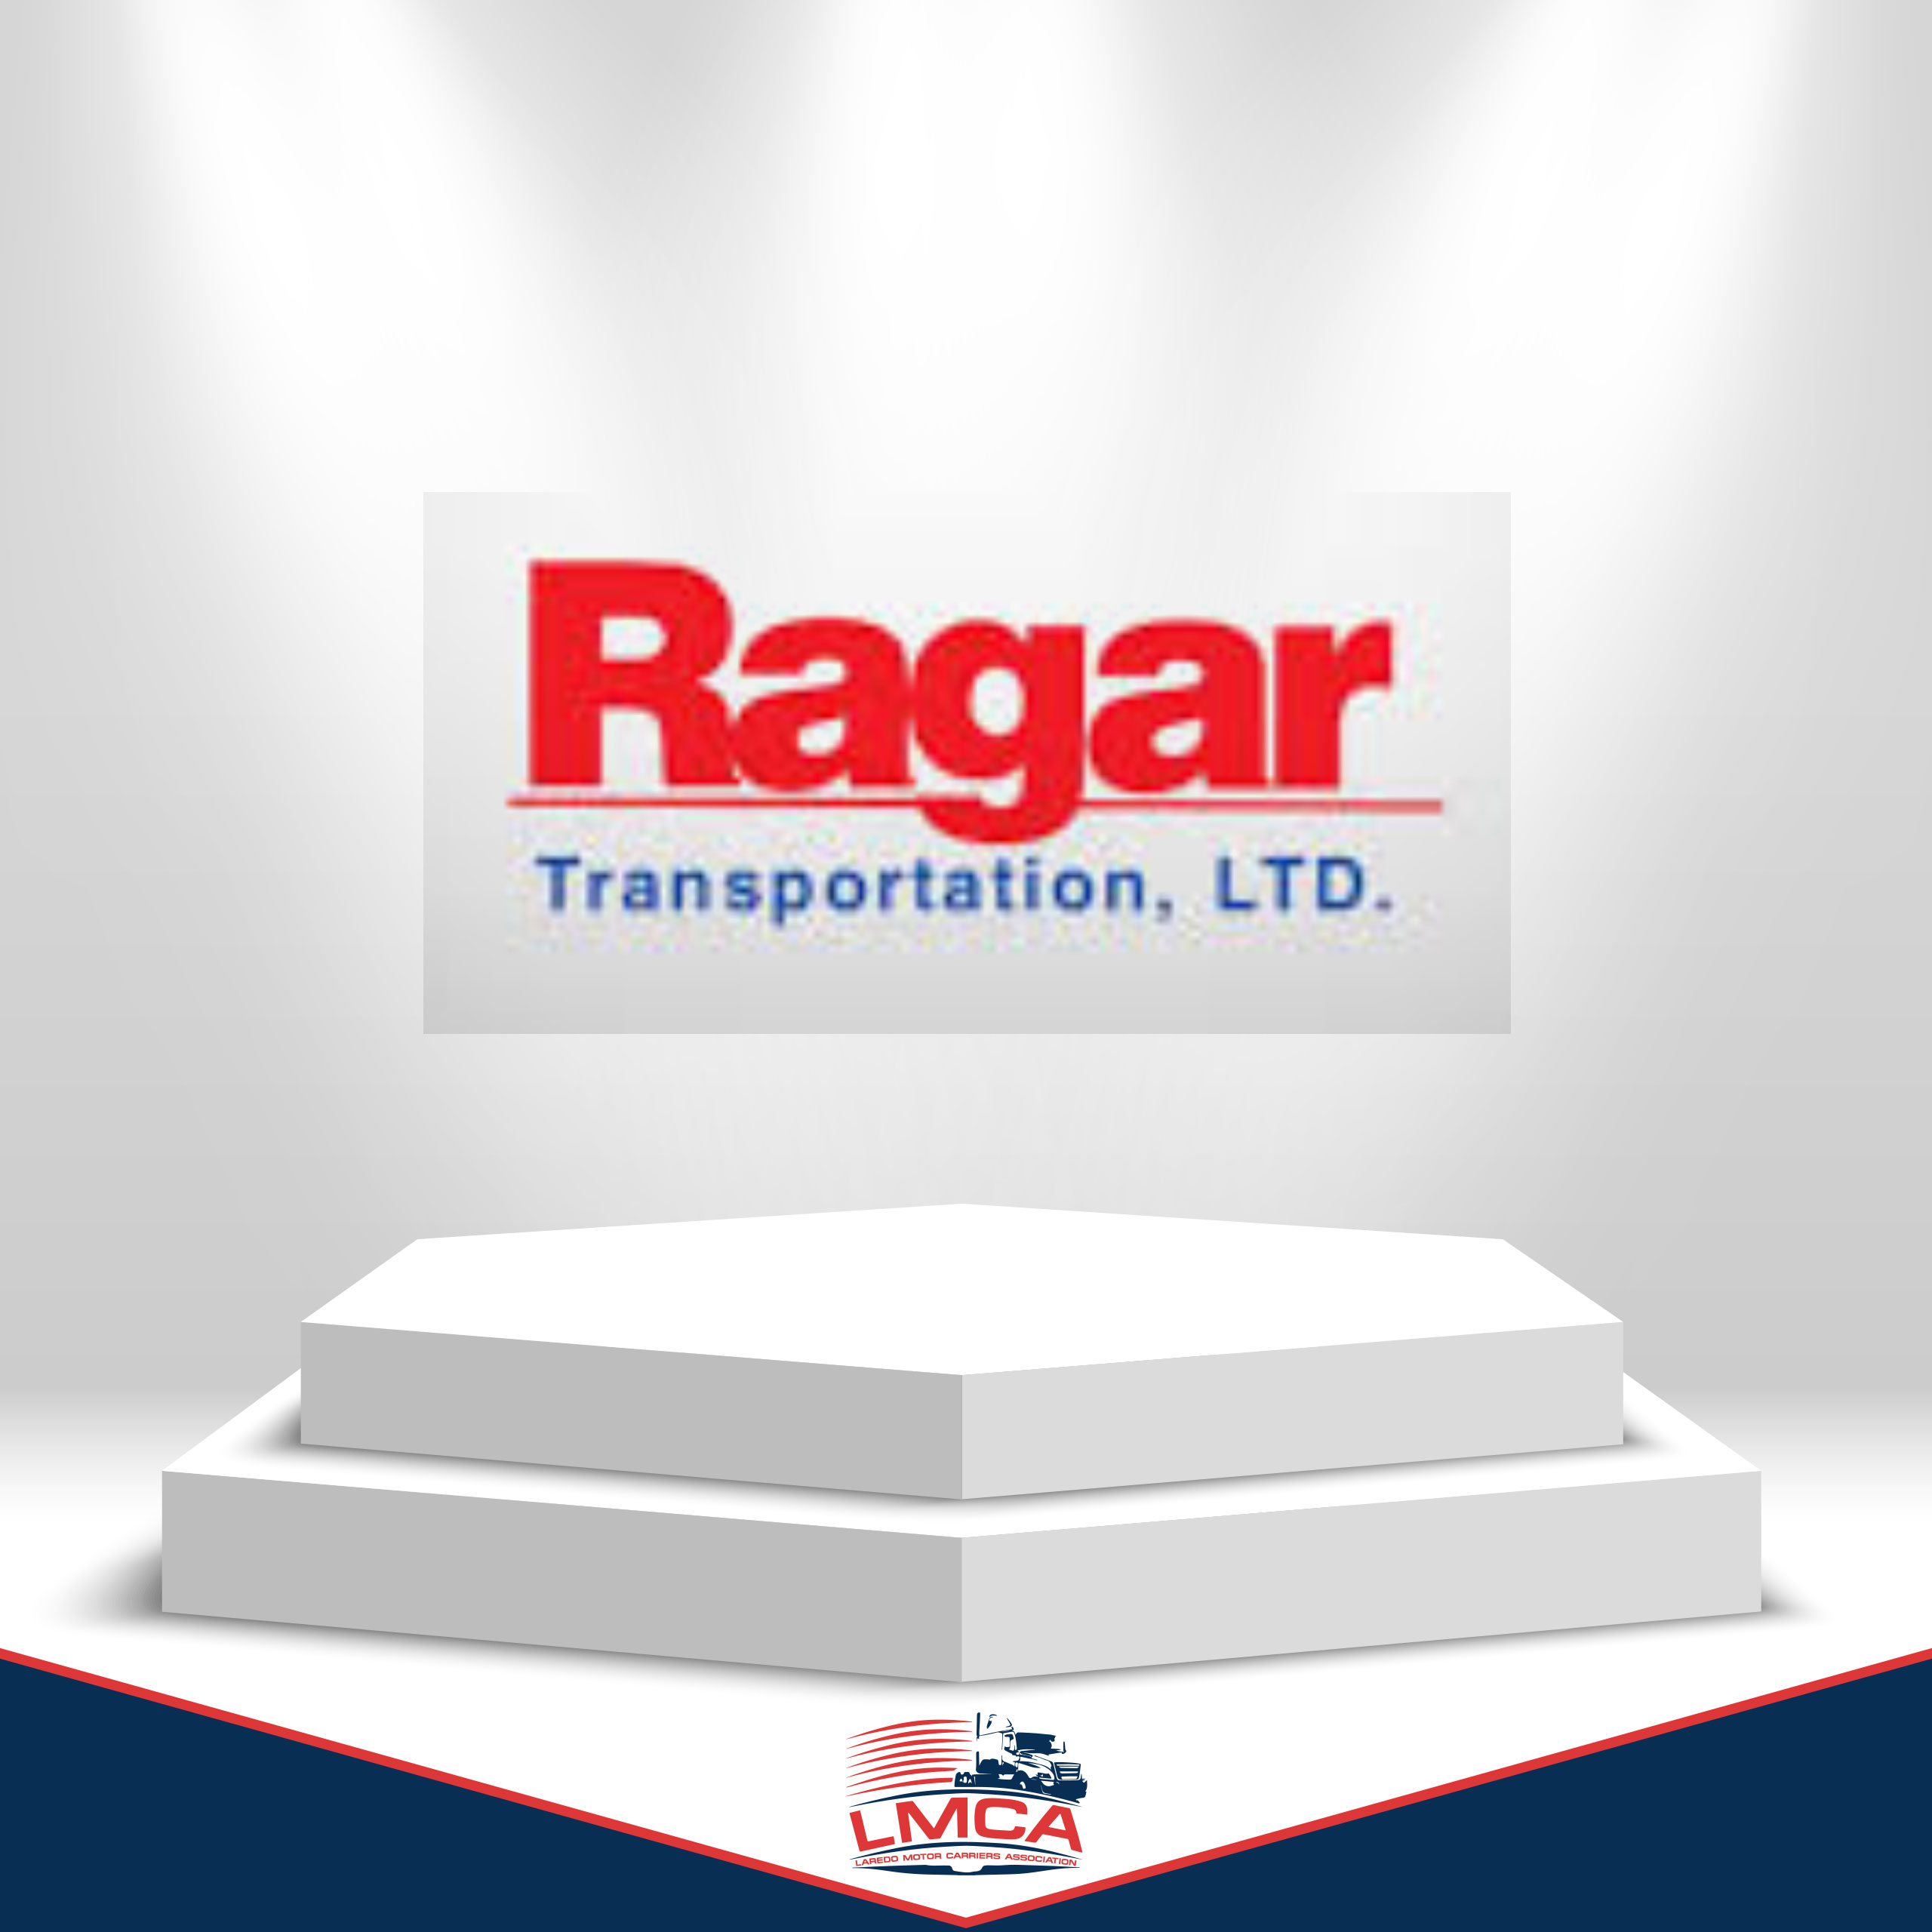 RAGAR-LMCA